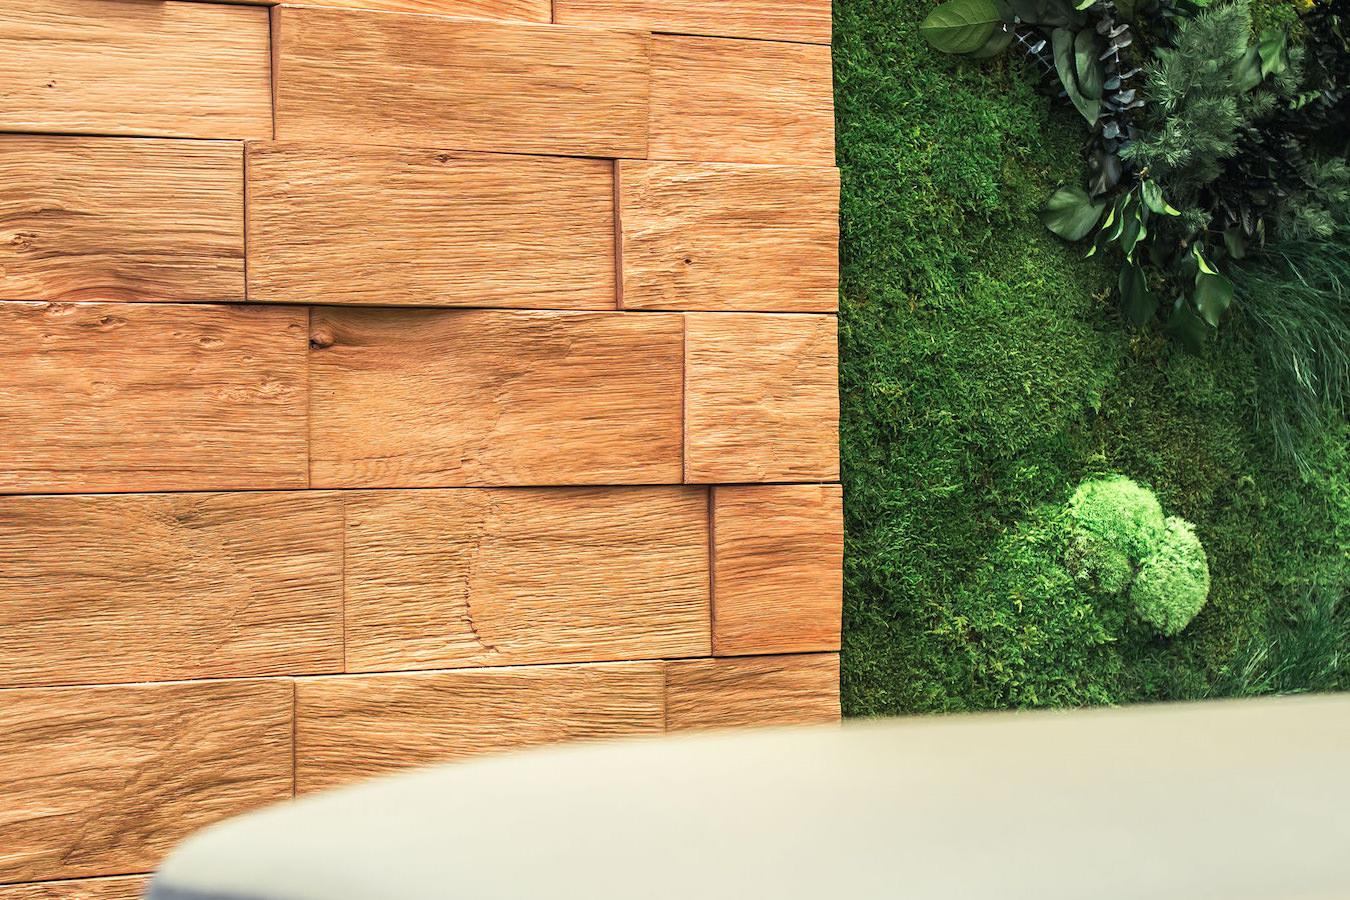 Makers: Stylegreen